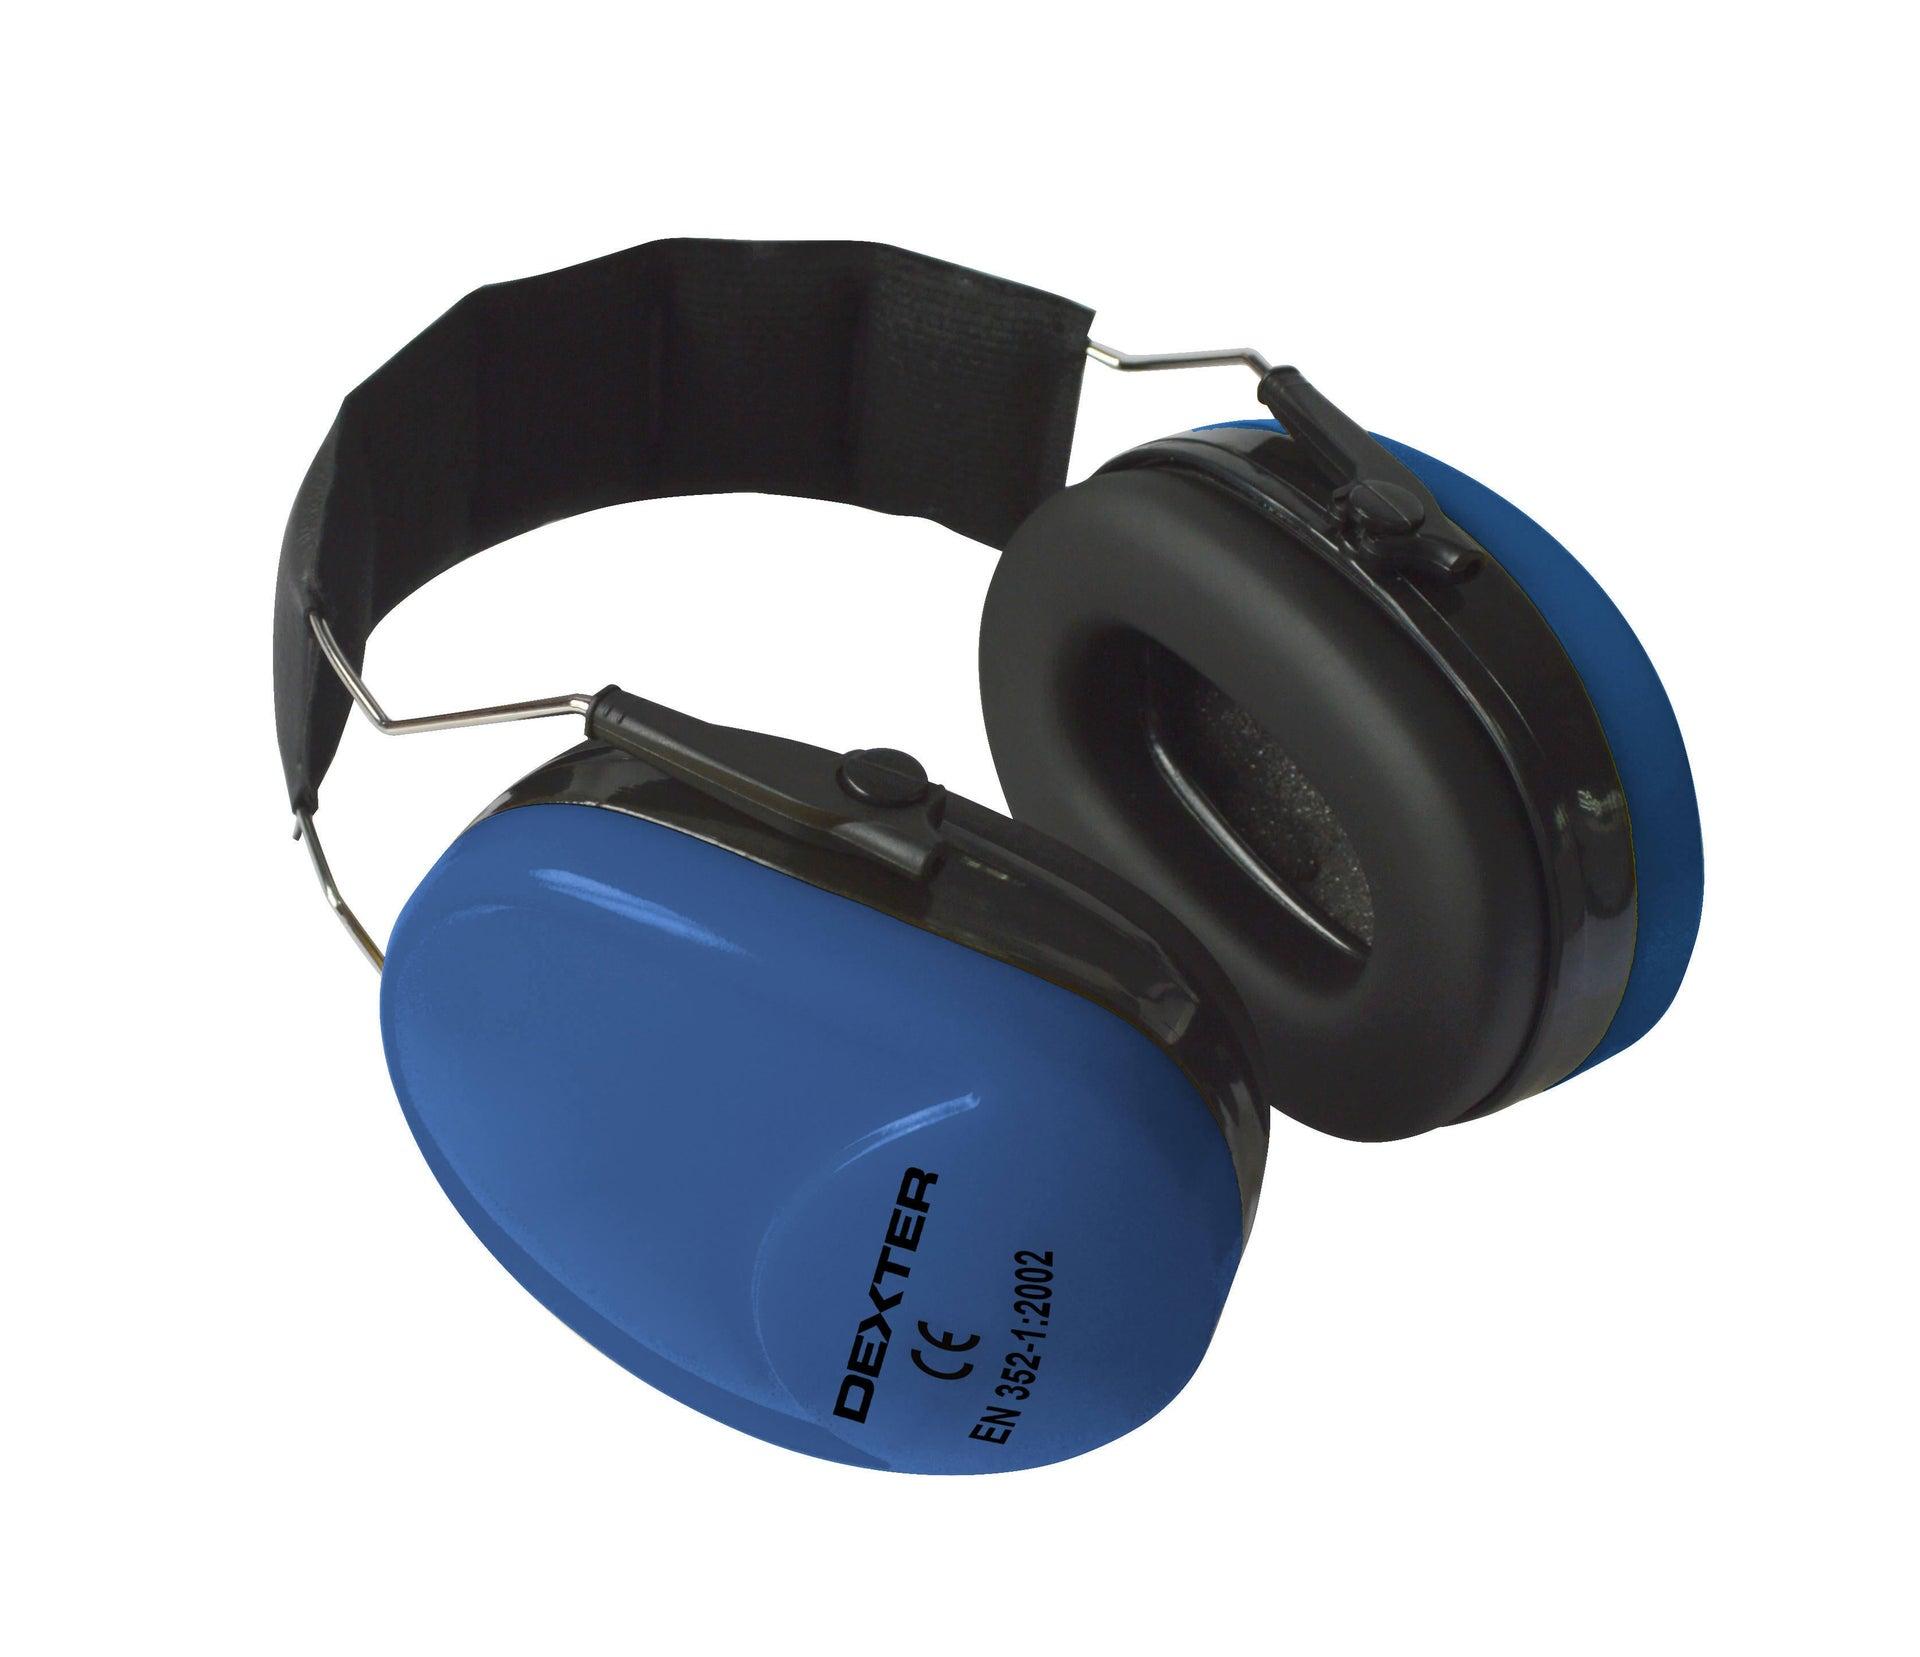 Cuffia antirumore SNR 29 dB DEXTER monouso - 1